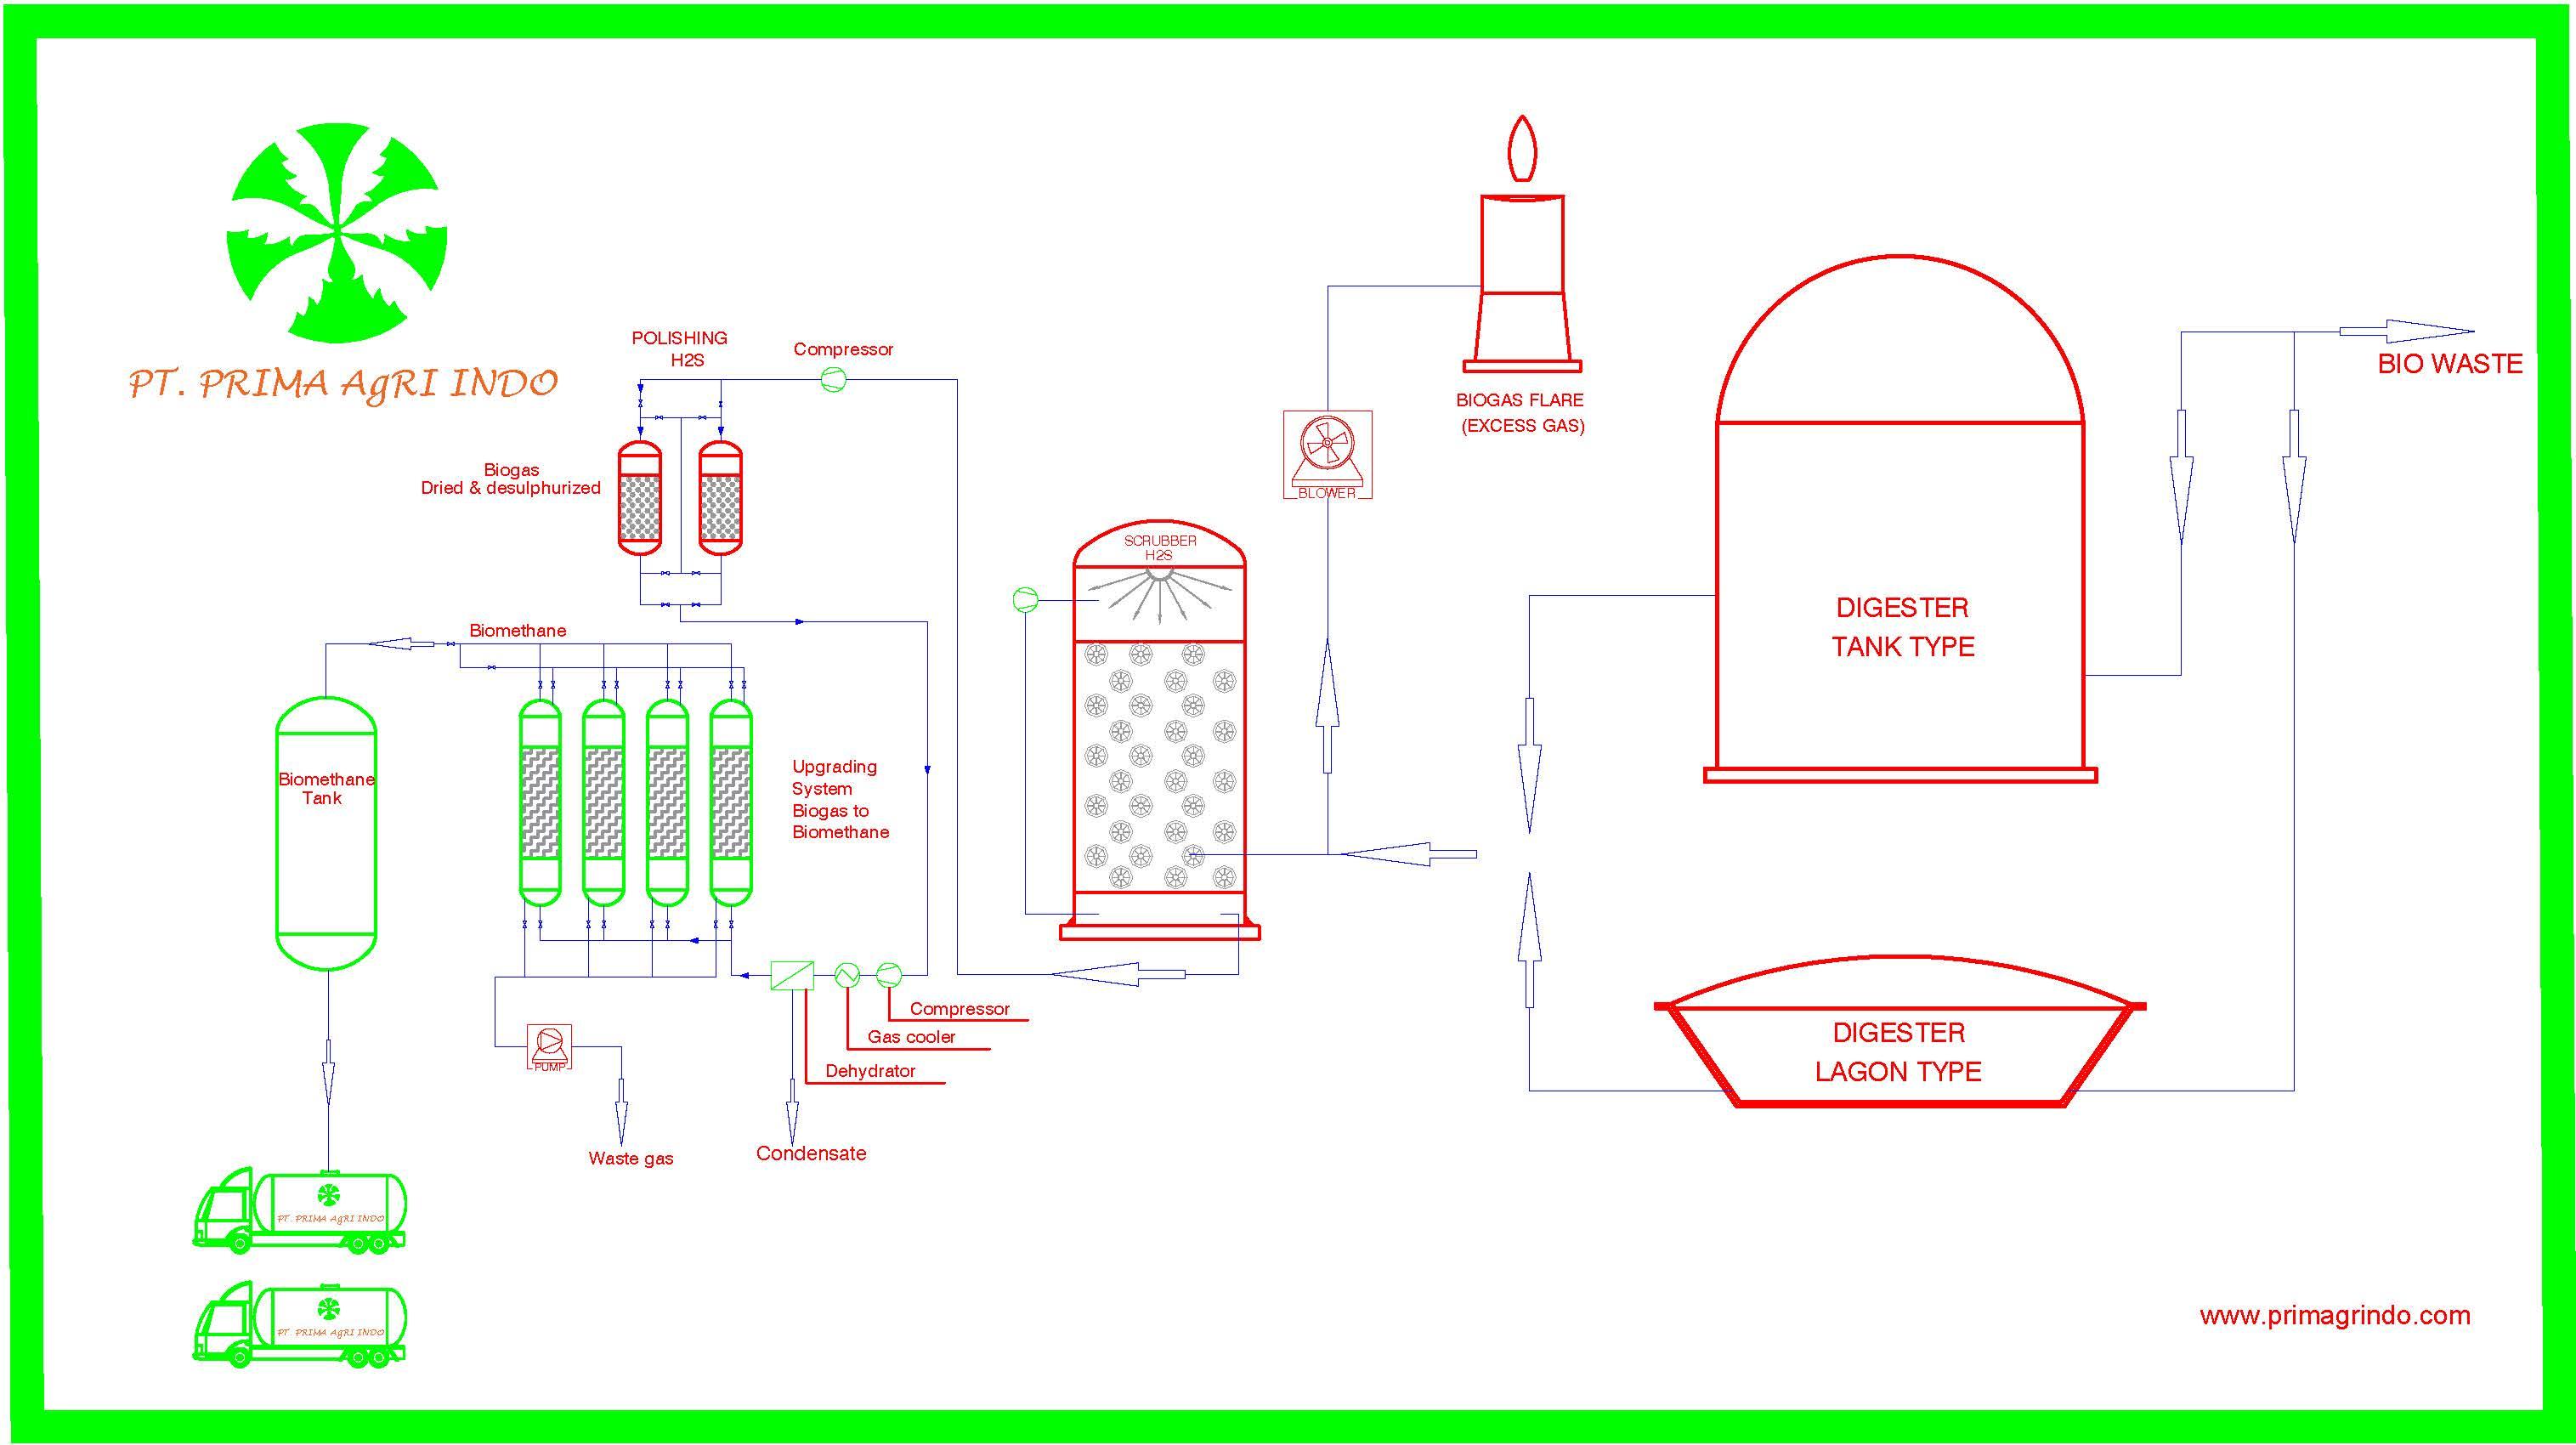 Biogas Purification – PRIMAGRINDO